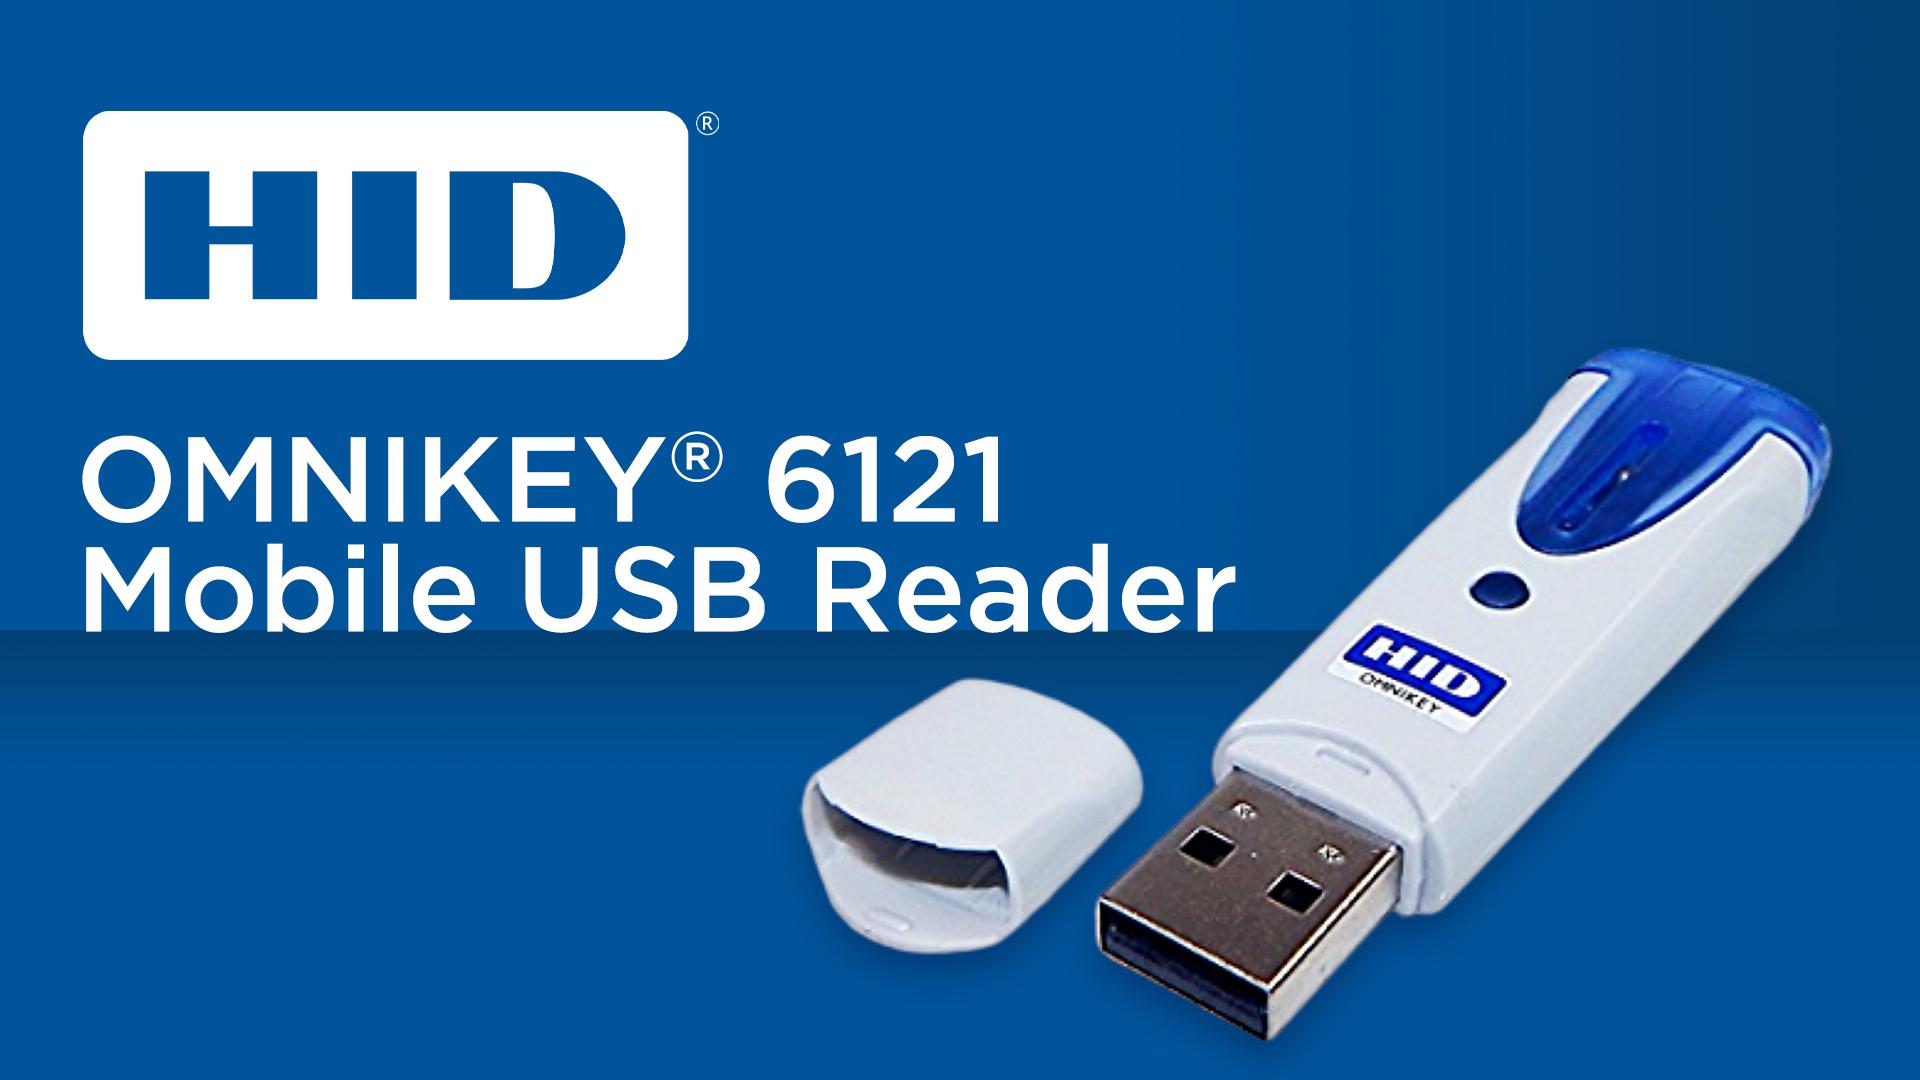 HID Omnikey 6121 Mobile USB Reader